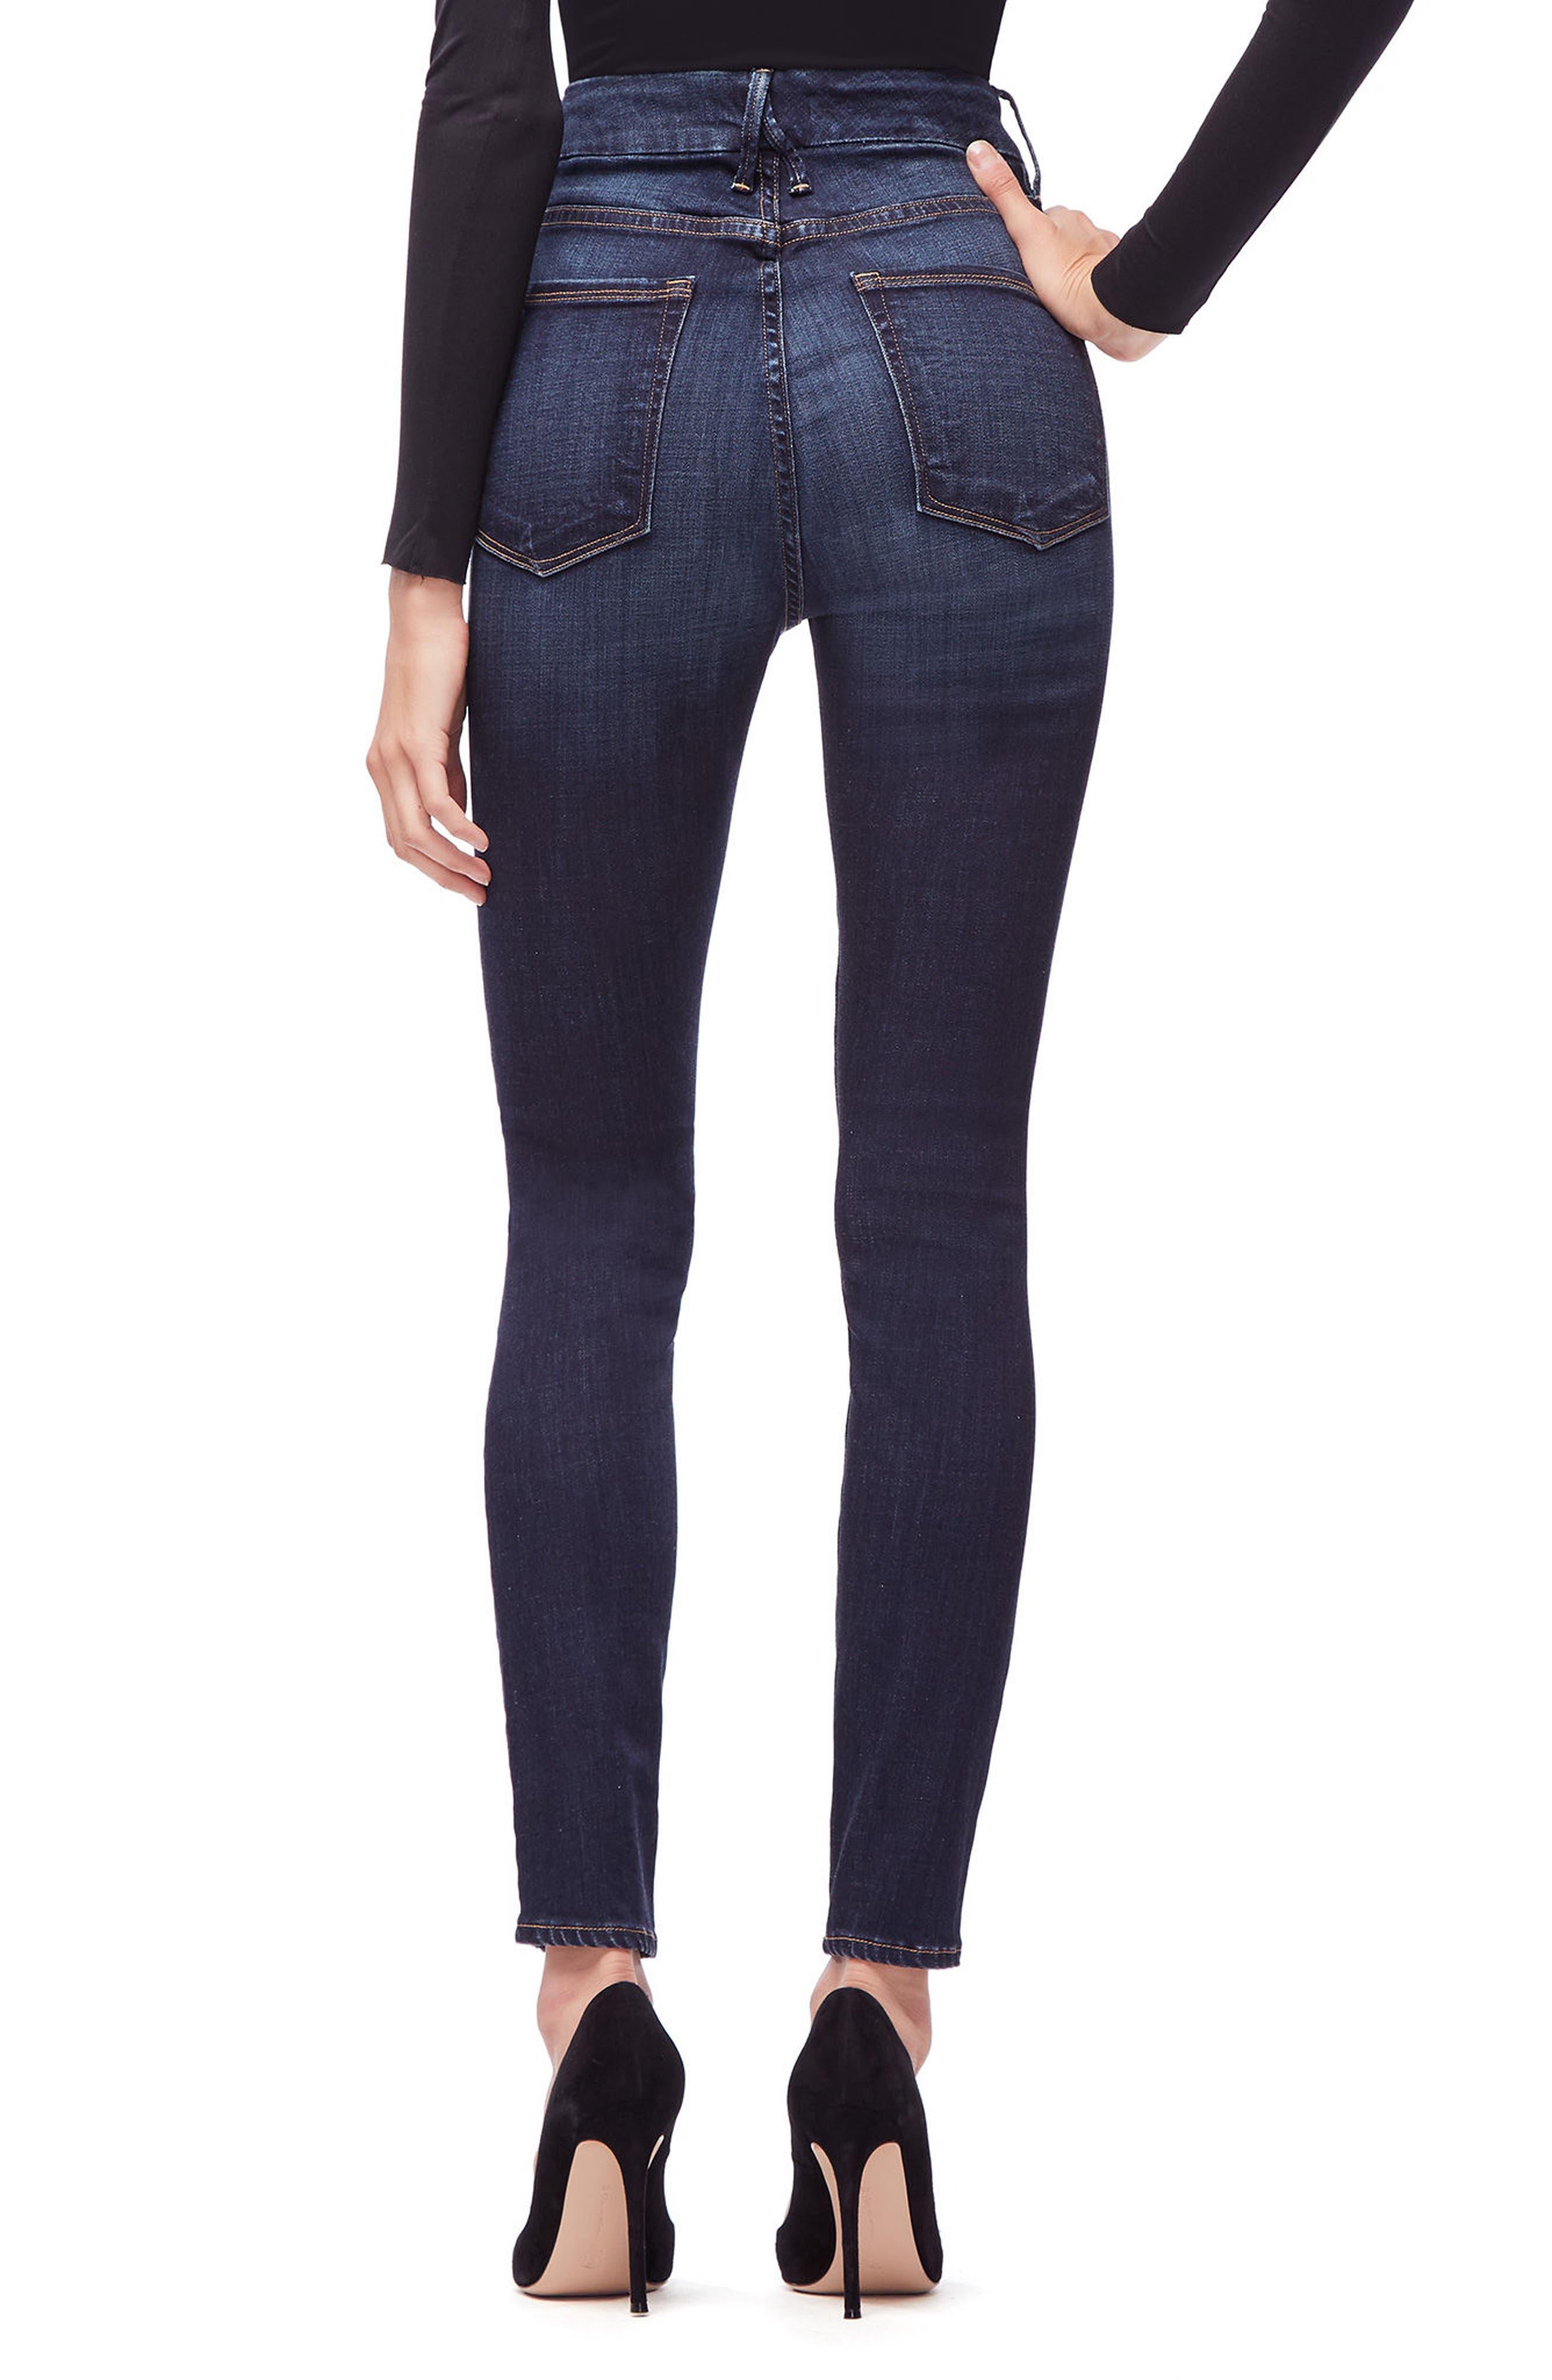 GOOD AMERICAN,                             Good Legs High Waist Skinny Jeans,                             Alternate thumbnail 2, color,                             401